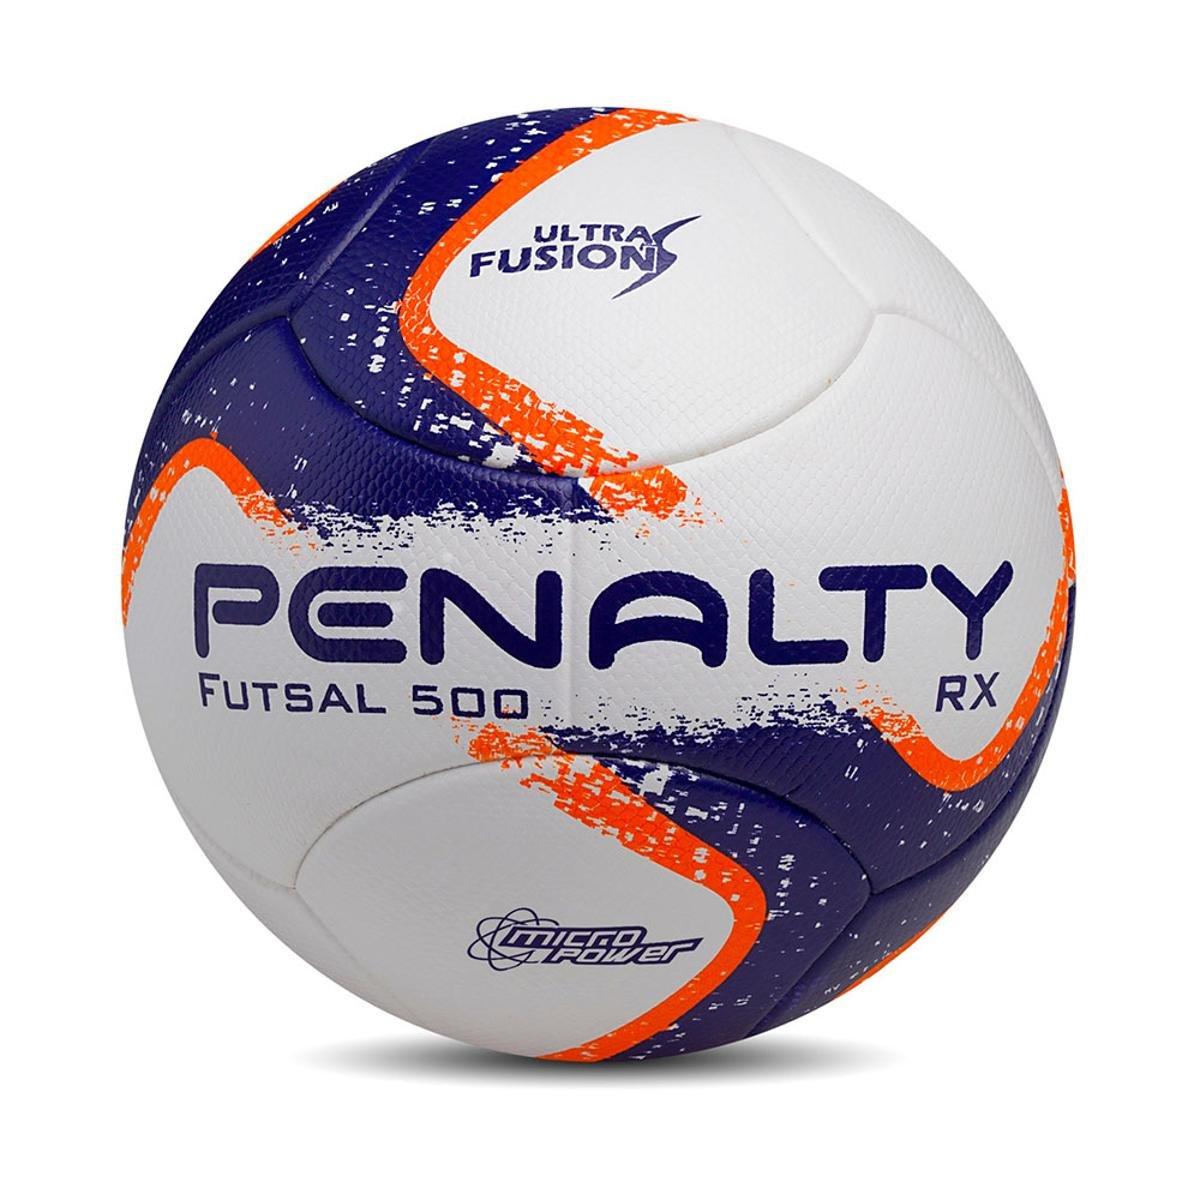 Bola Futsal Penalty Rx500 R1 Fusion VII - Compre Agora  9a54b3461bc05